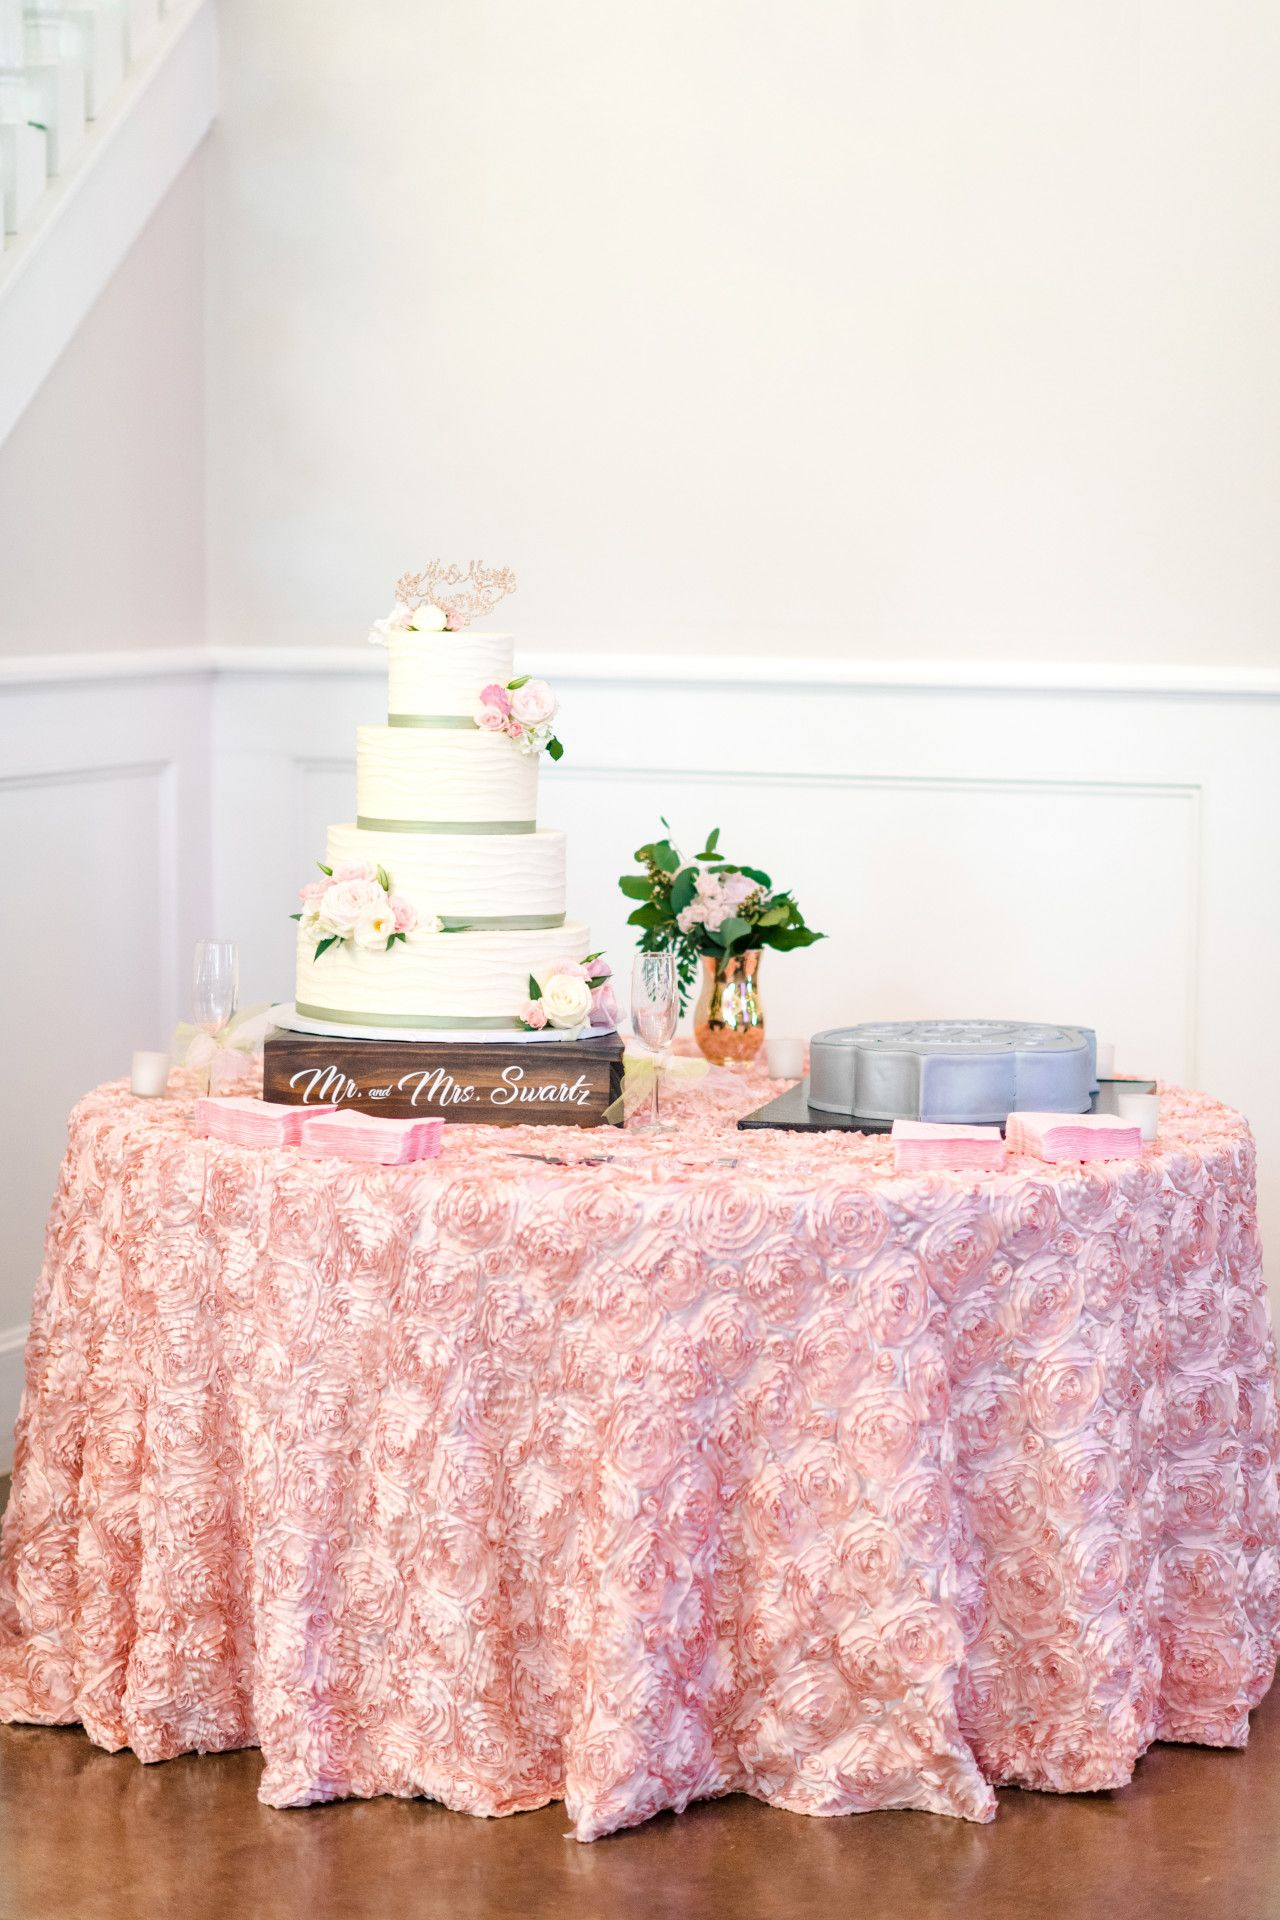 Wedding cake table decoration ideas  rose petal pink wedding linen  modern rustic wedding cake table